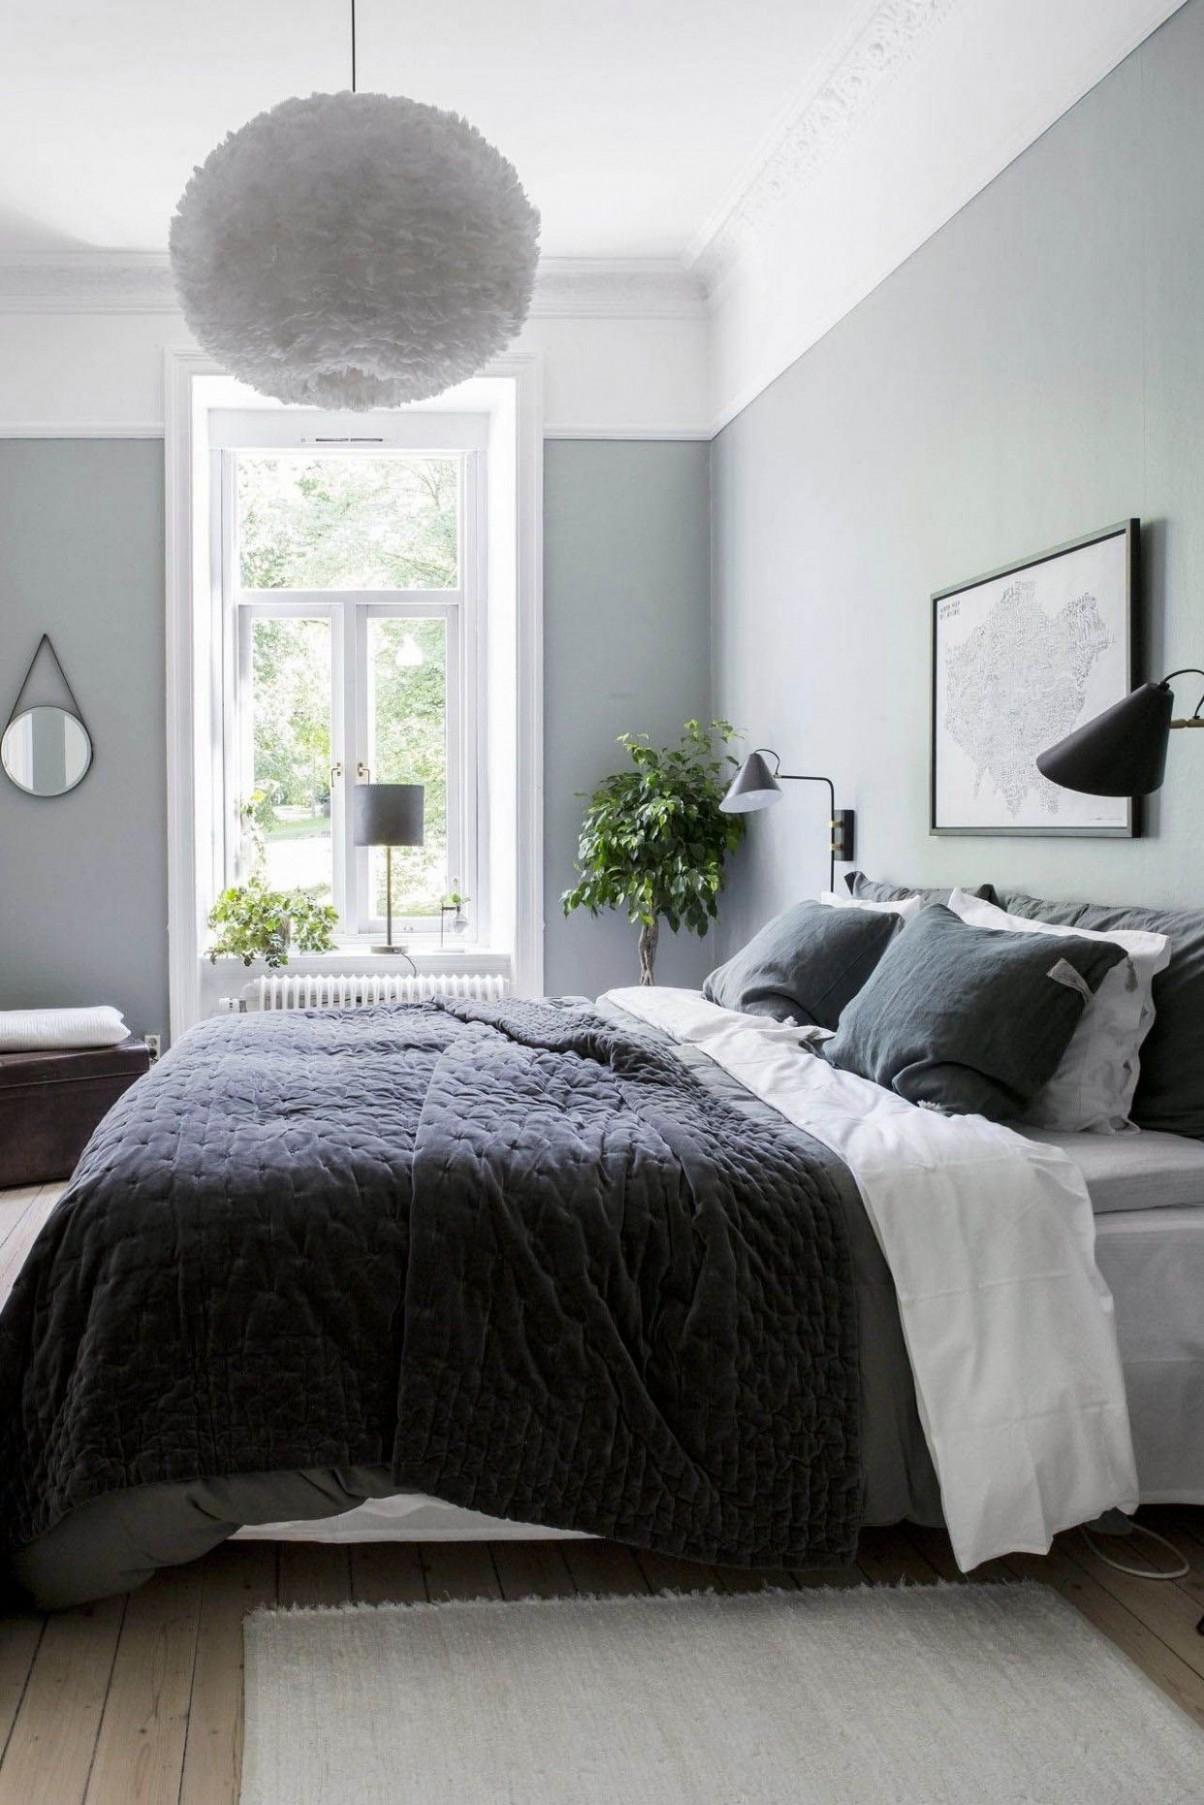 Unique Bedroom Ideas Nz  Sage green bedroom, Home decor bedroom  - Bedroom Ideas Nz